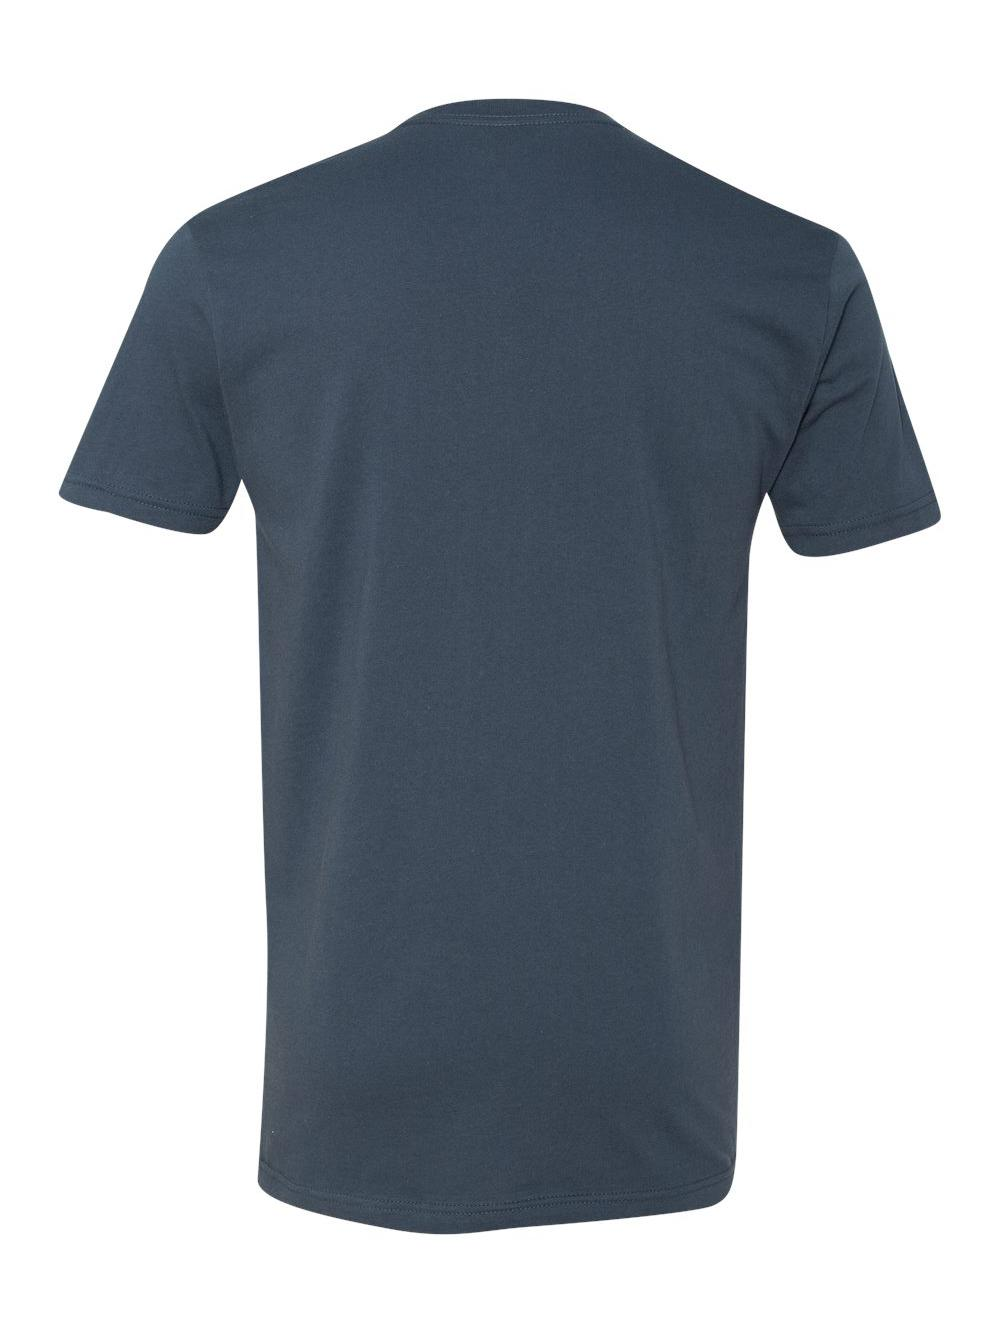 Next-Level-Premium-Short-Sleeve-V-3200 thumbnail 19